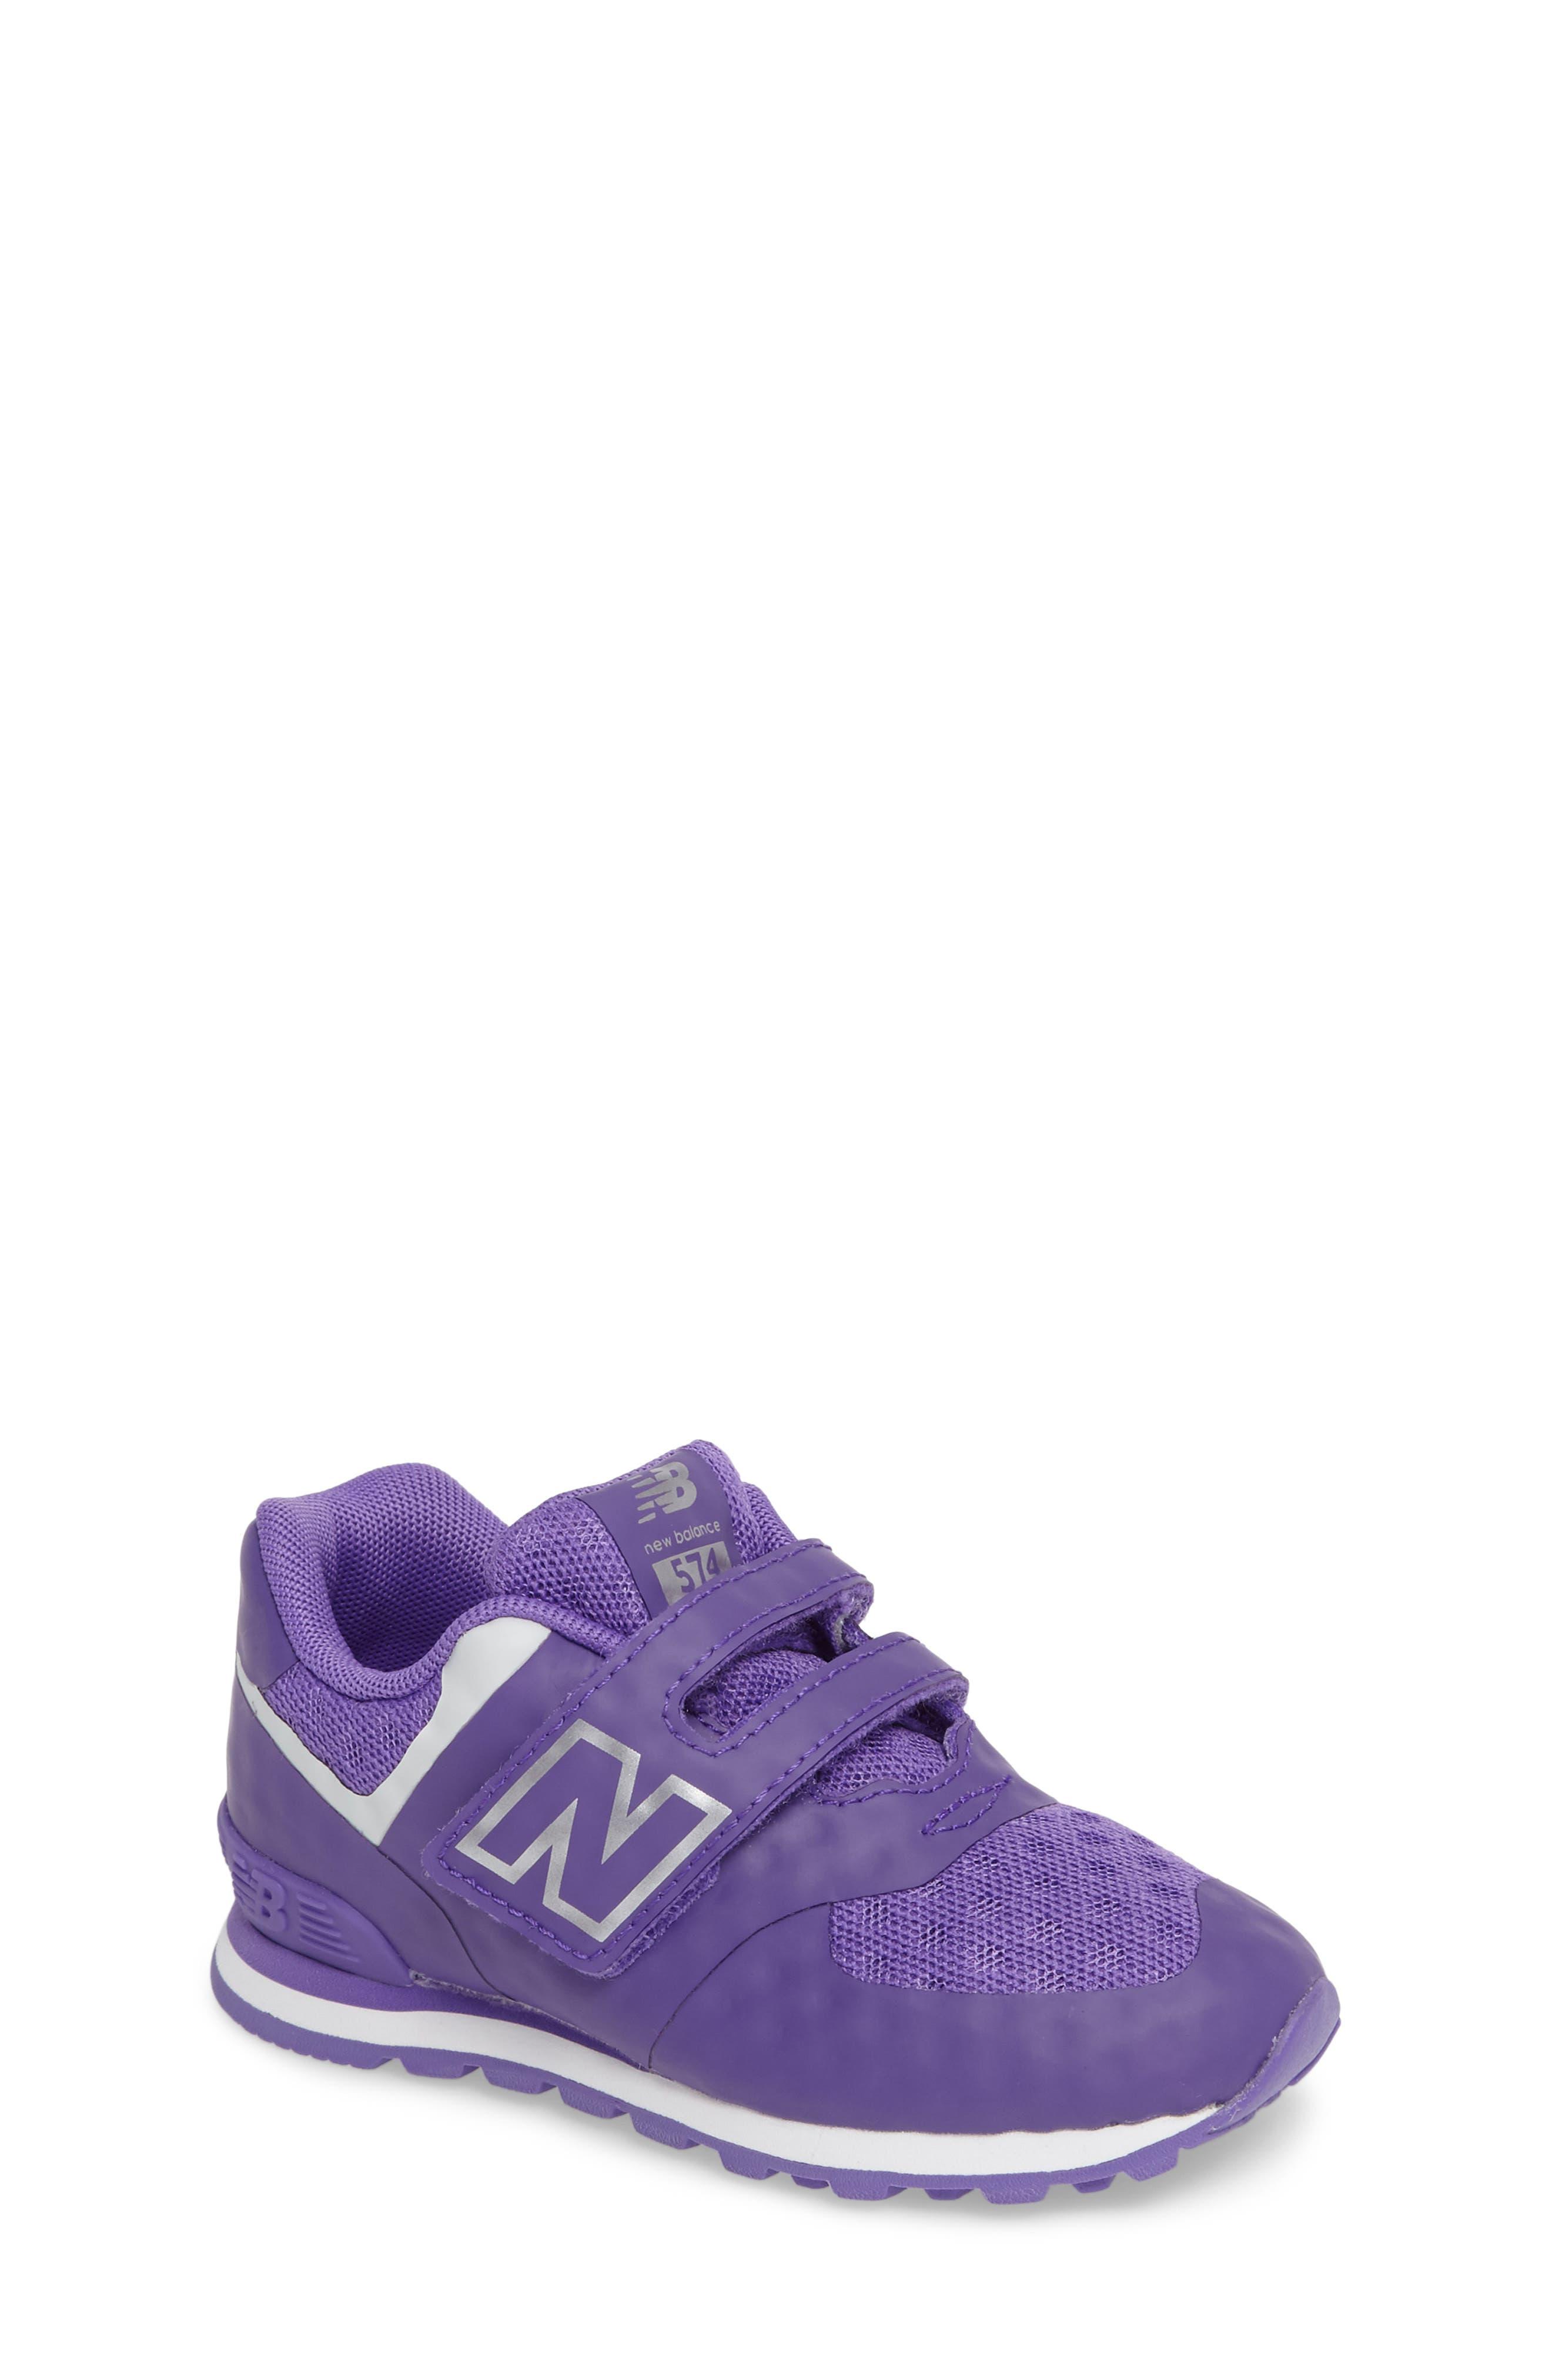 Main Image - New Balance 574 Sneaker (Baby, Walker, Toddler, Little Kid & Big Kid)